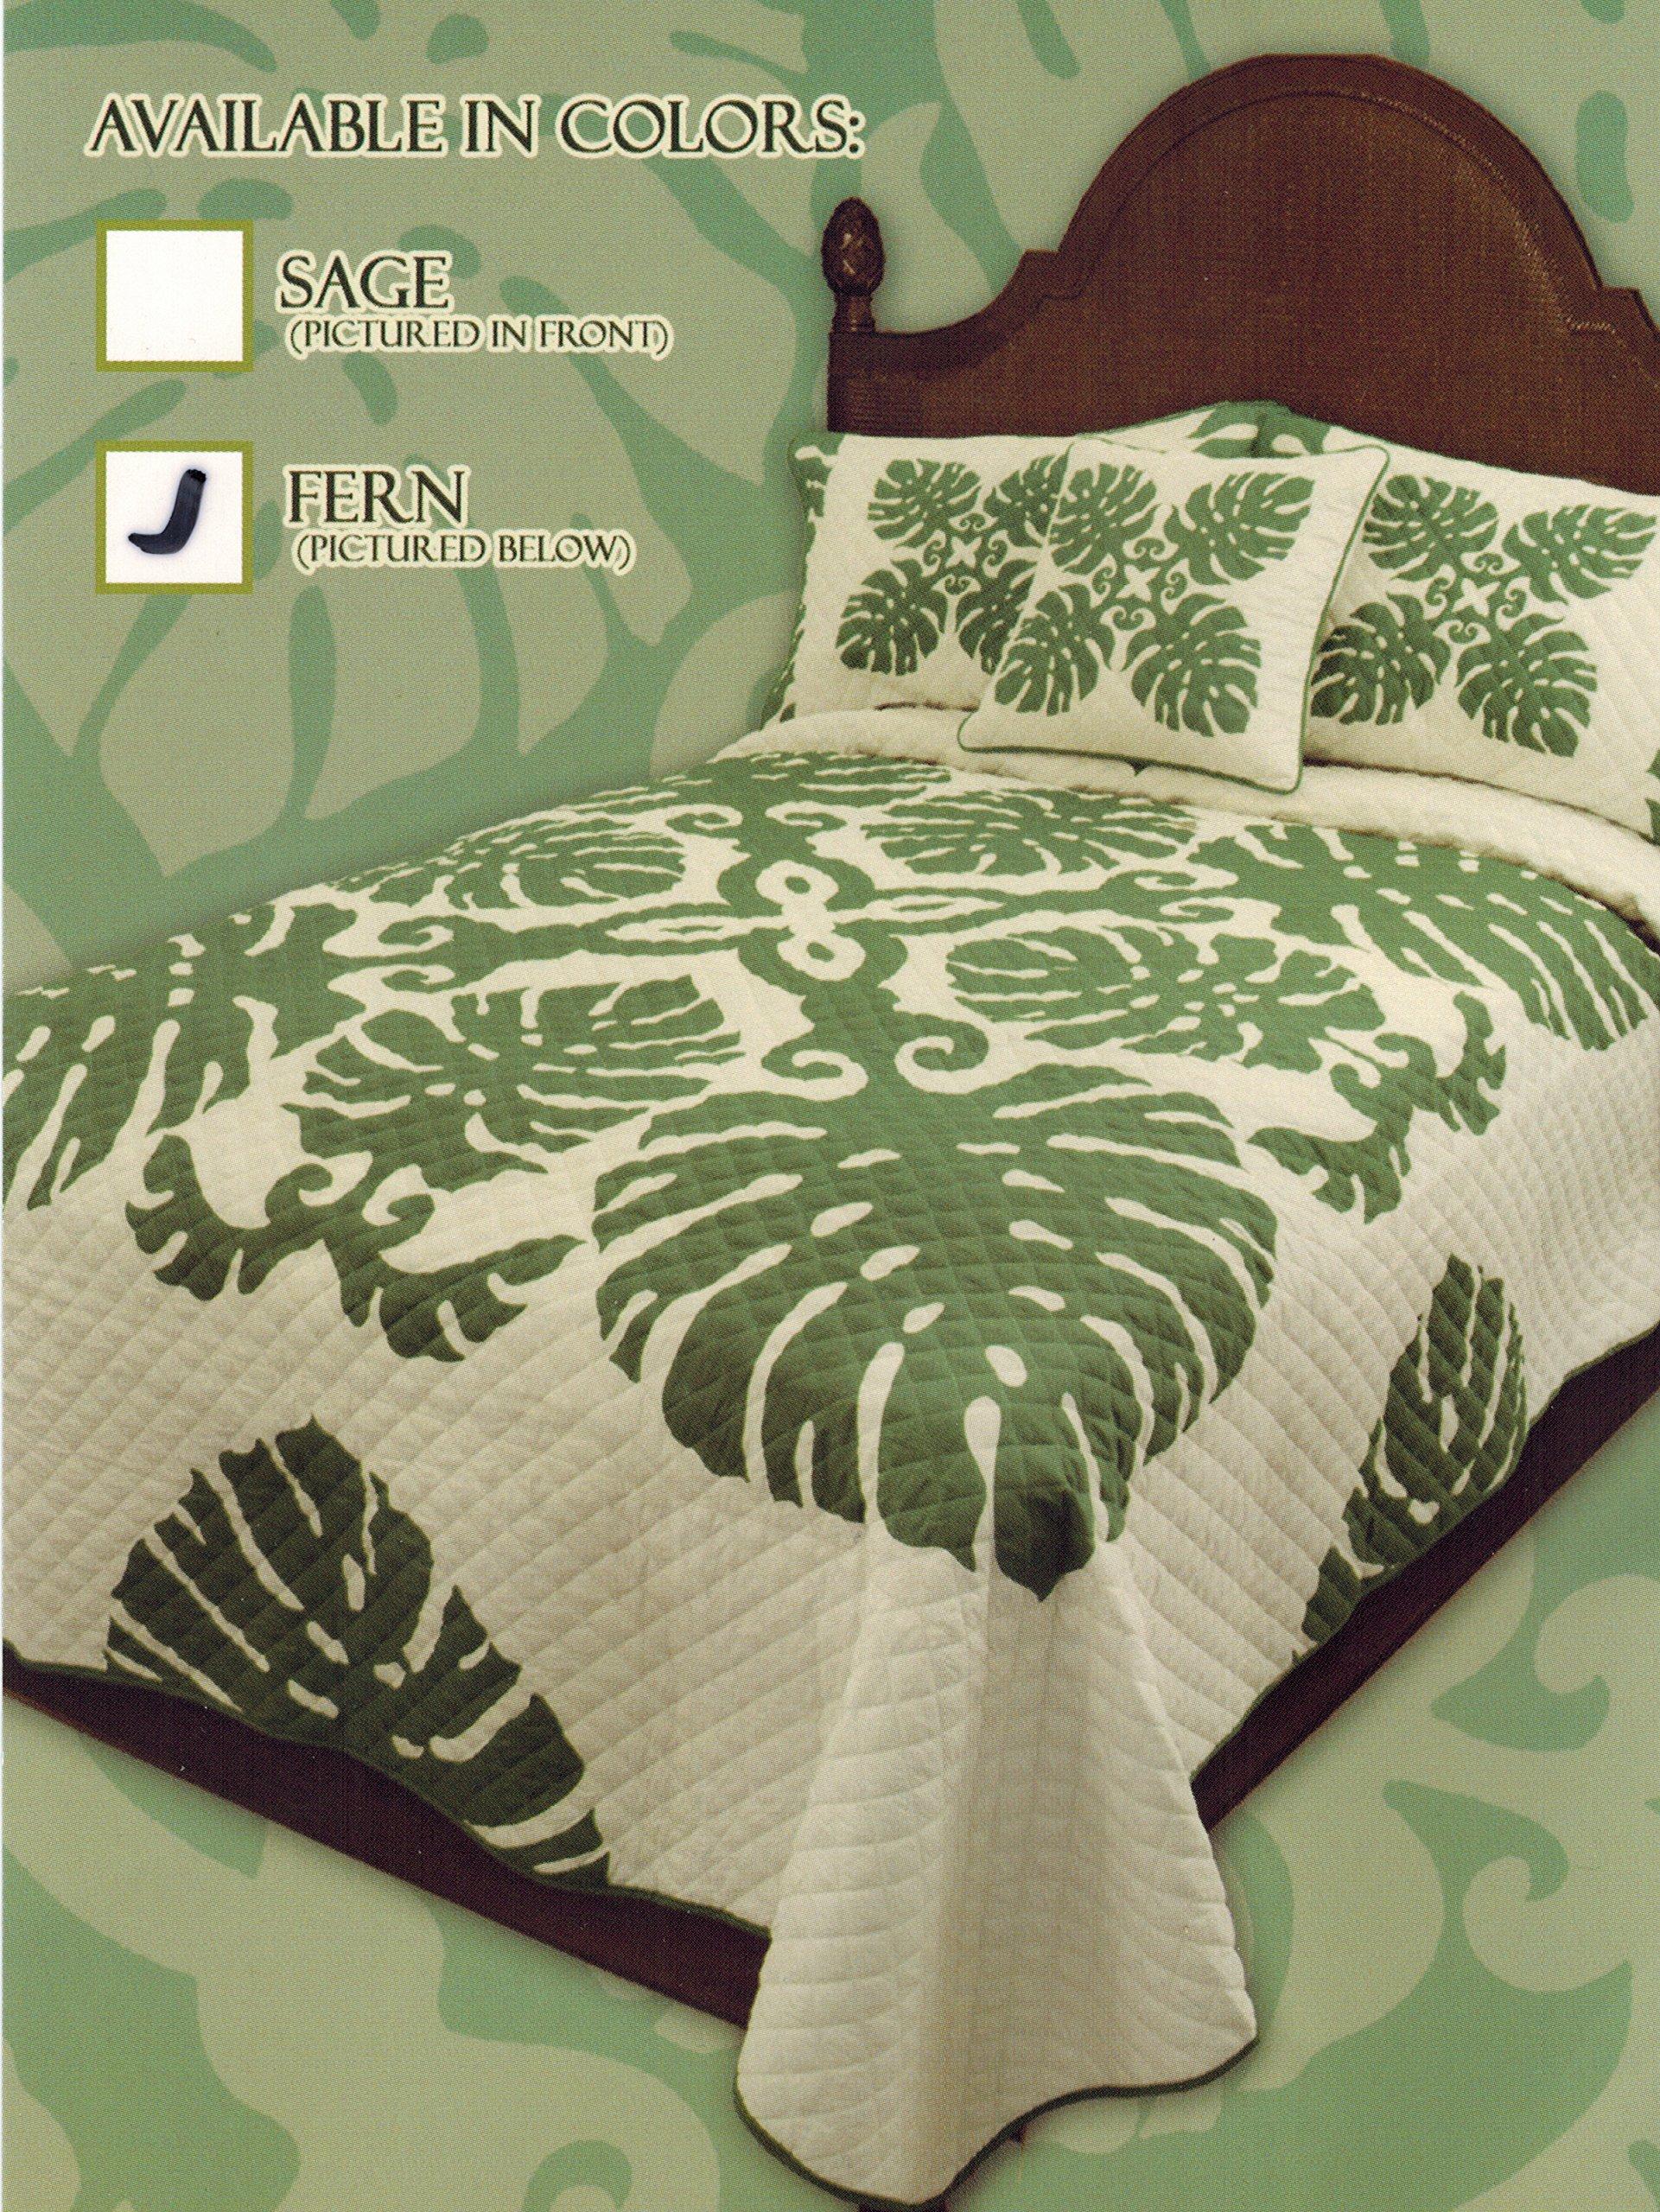 King Hawaiian Quilt bedding Comforter 100% cotton with two pillow shams Fern Green